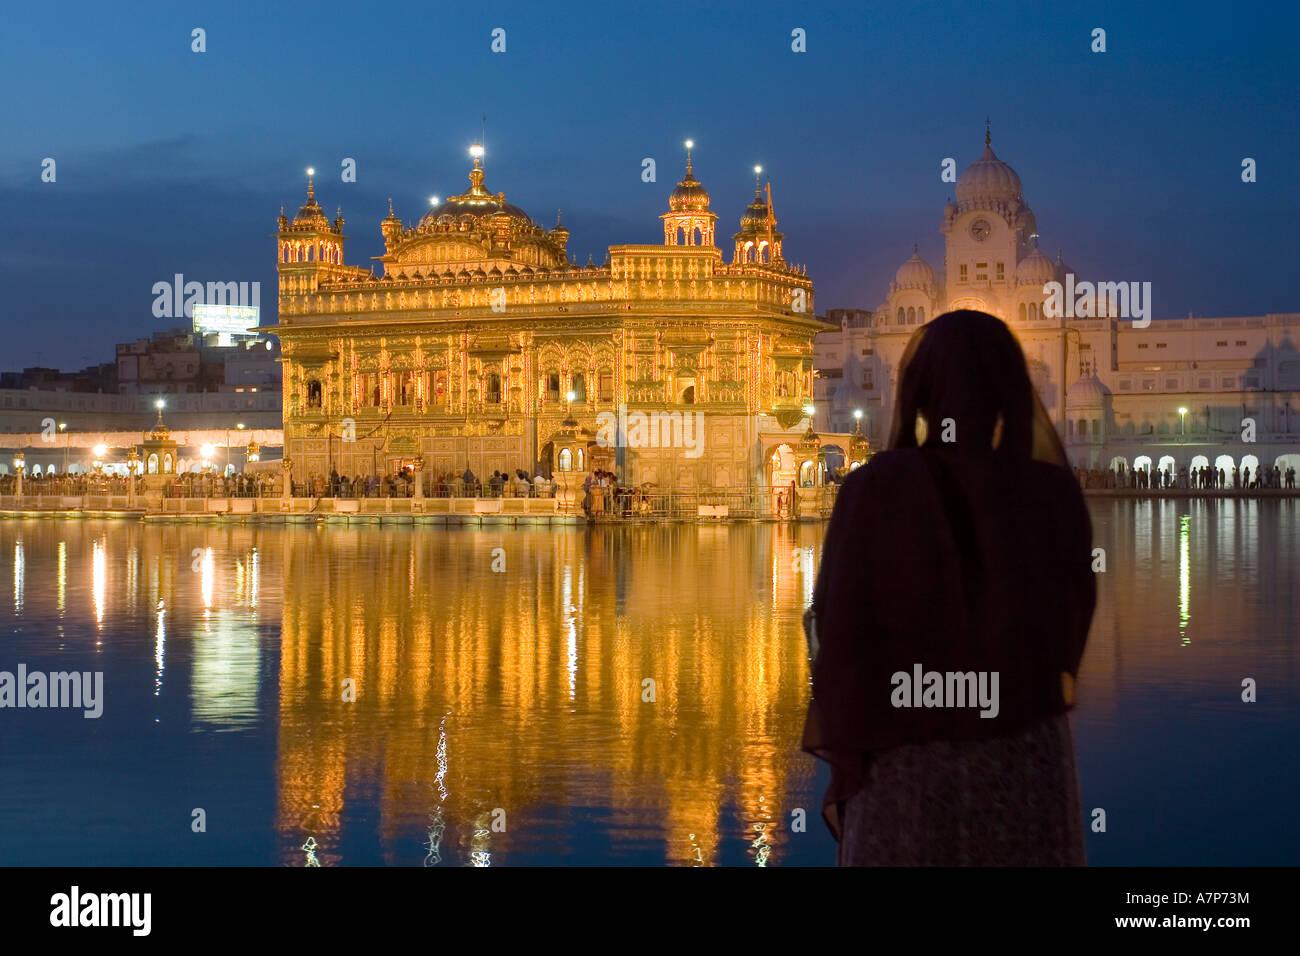 Donna indiana pregando, Sikh Tempio d'oro di Amritsar Punjab, India Immagini Stock